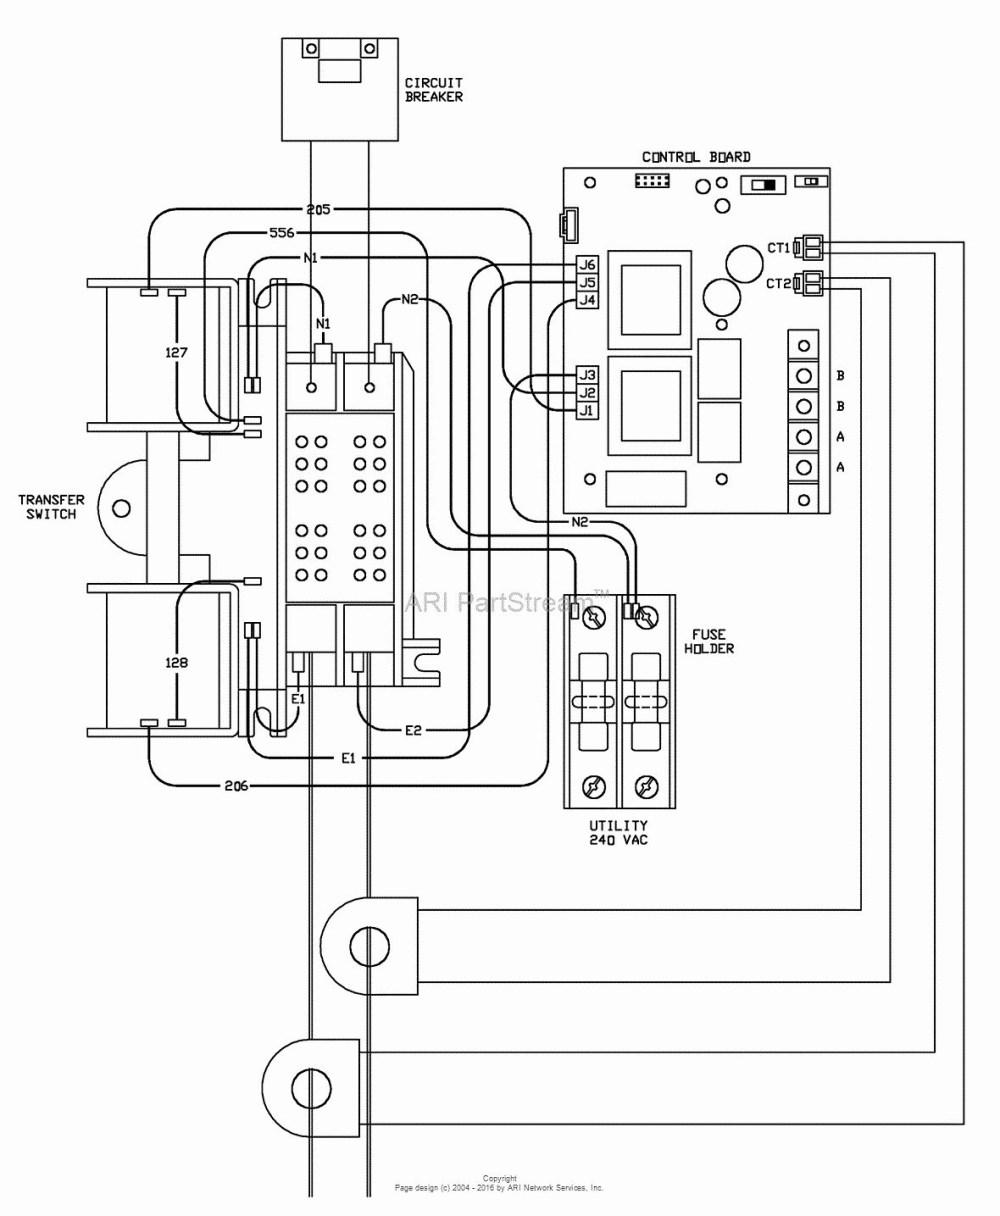 medium resolution of generac ignition switch wiring diagram schematic diagramgenerac ats wiring diagram two wire start wiring diagram voltage